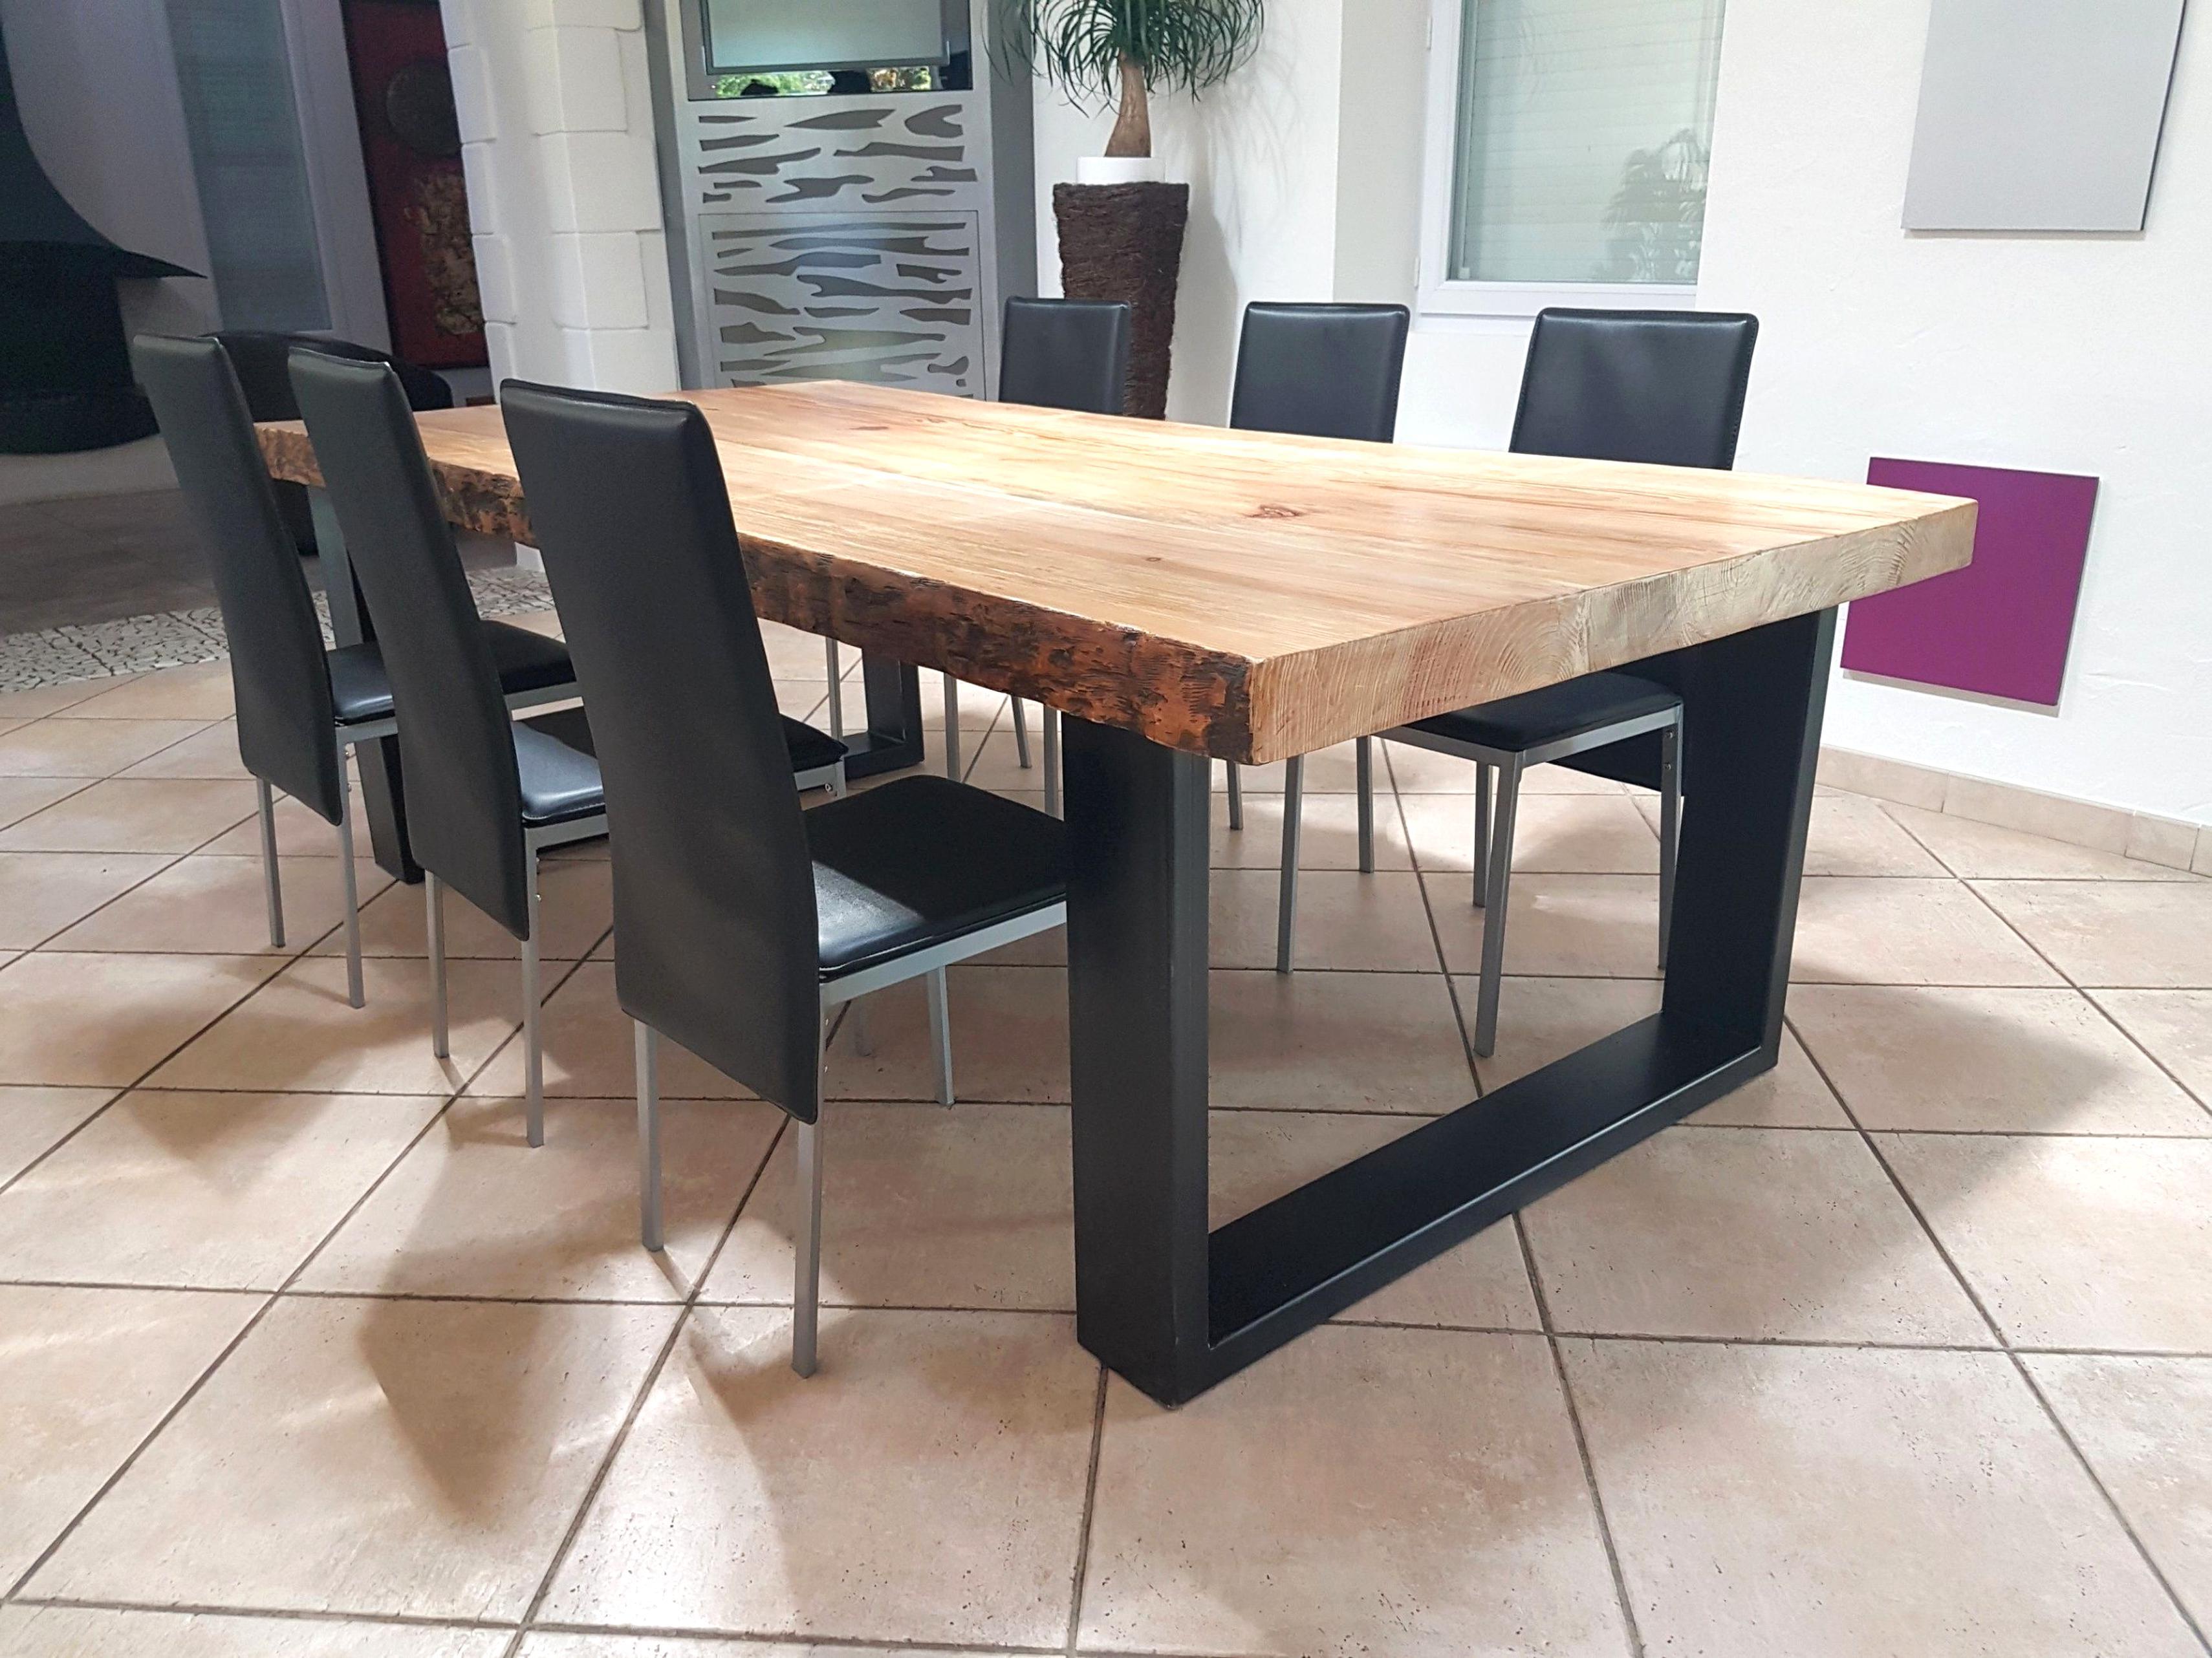 Table salle manger bois metal d occasion - Table salle a manger acier ...